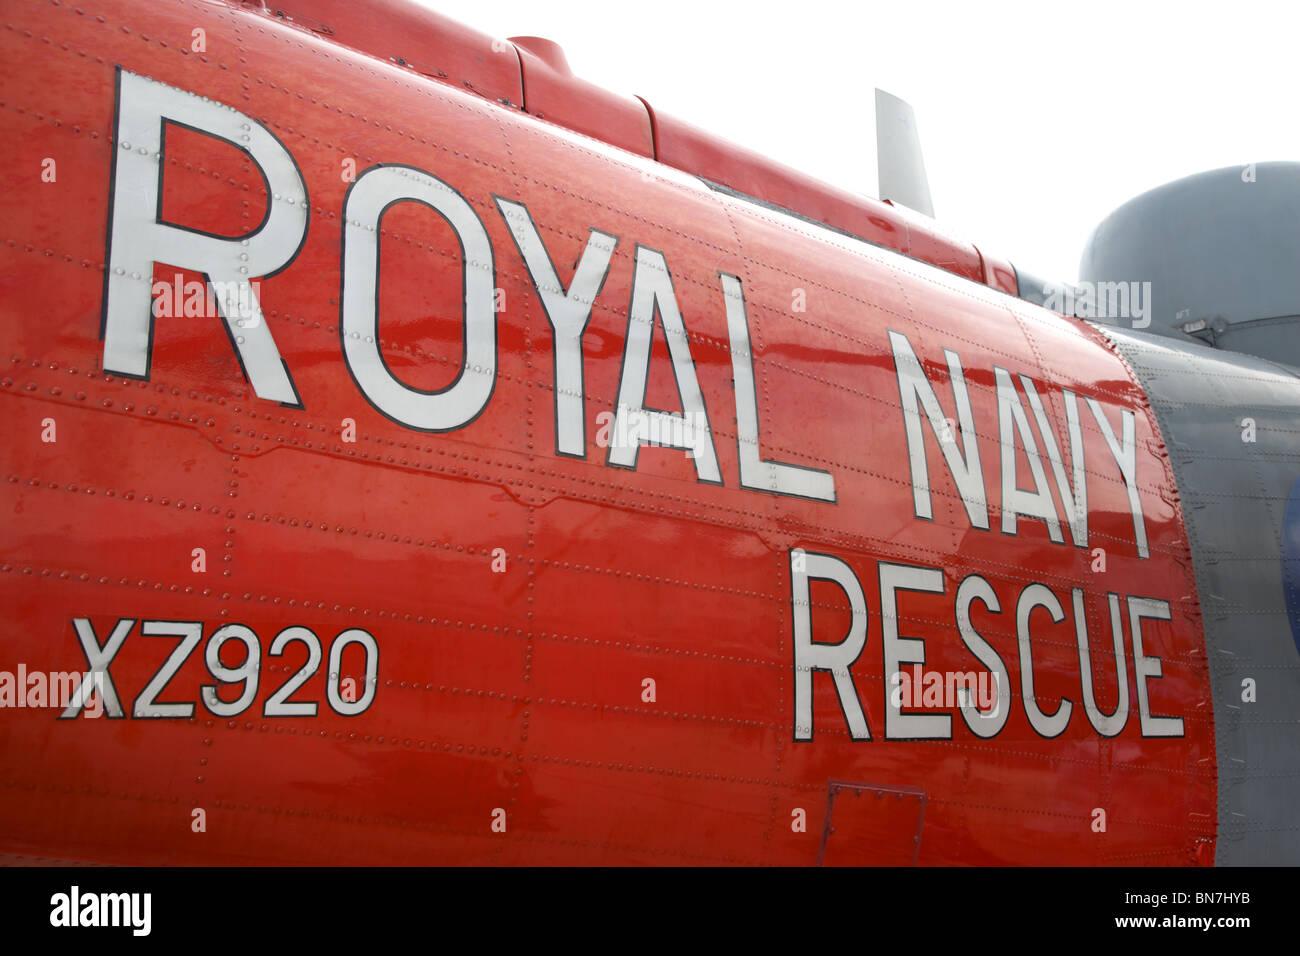 Royal Navy Rescue Westland Sea King HU5 helicopter XZ920 visiting Bangor Northern Ireland UK - Stock Image